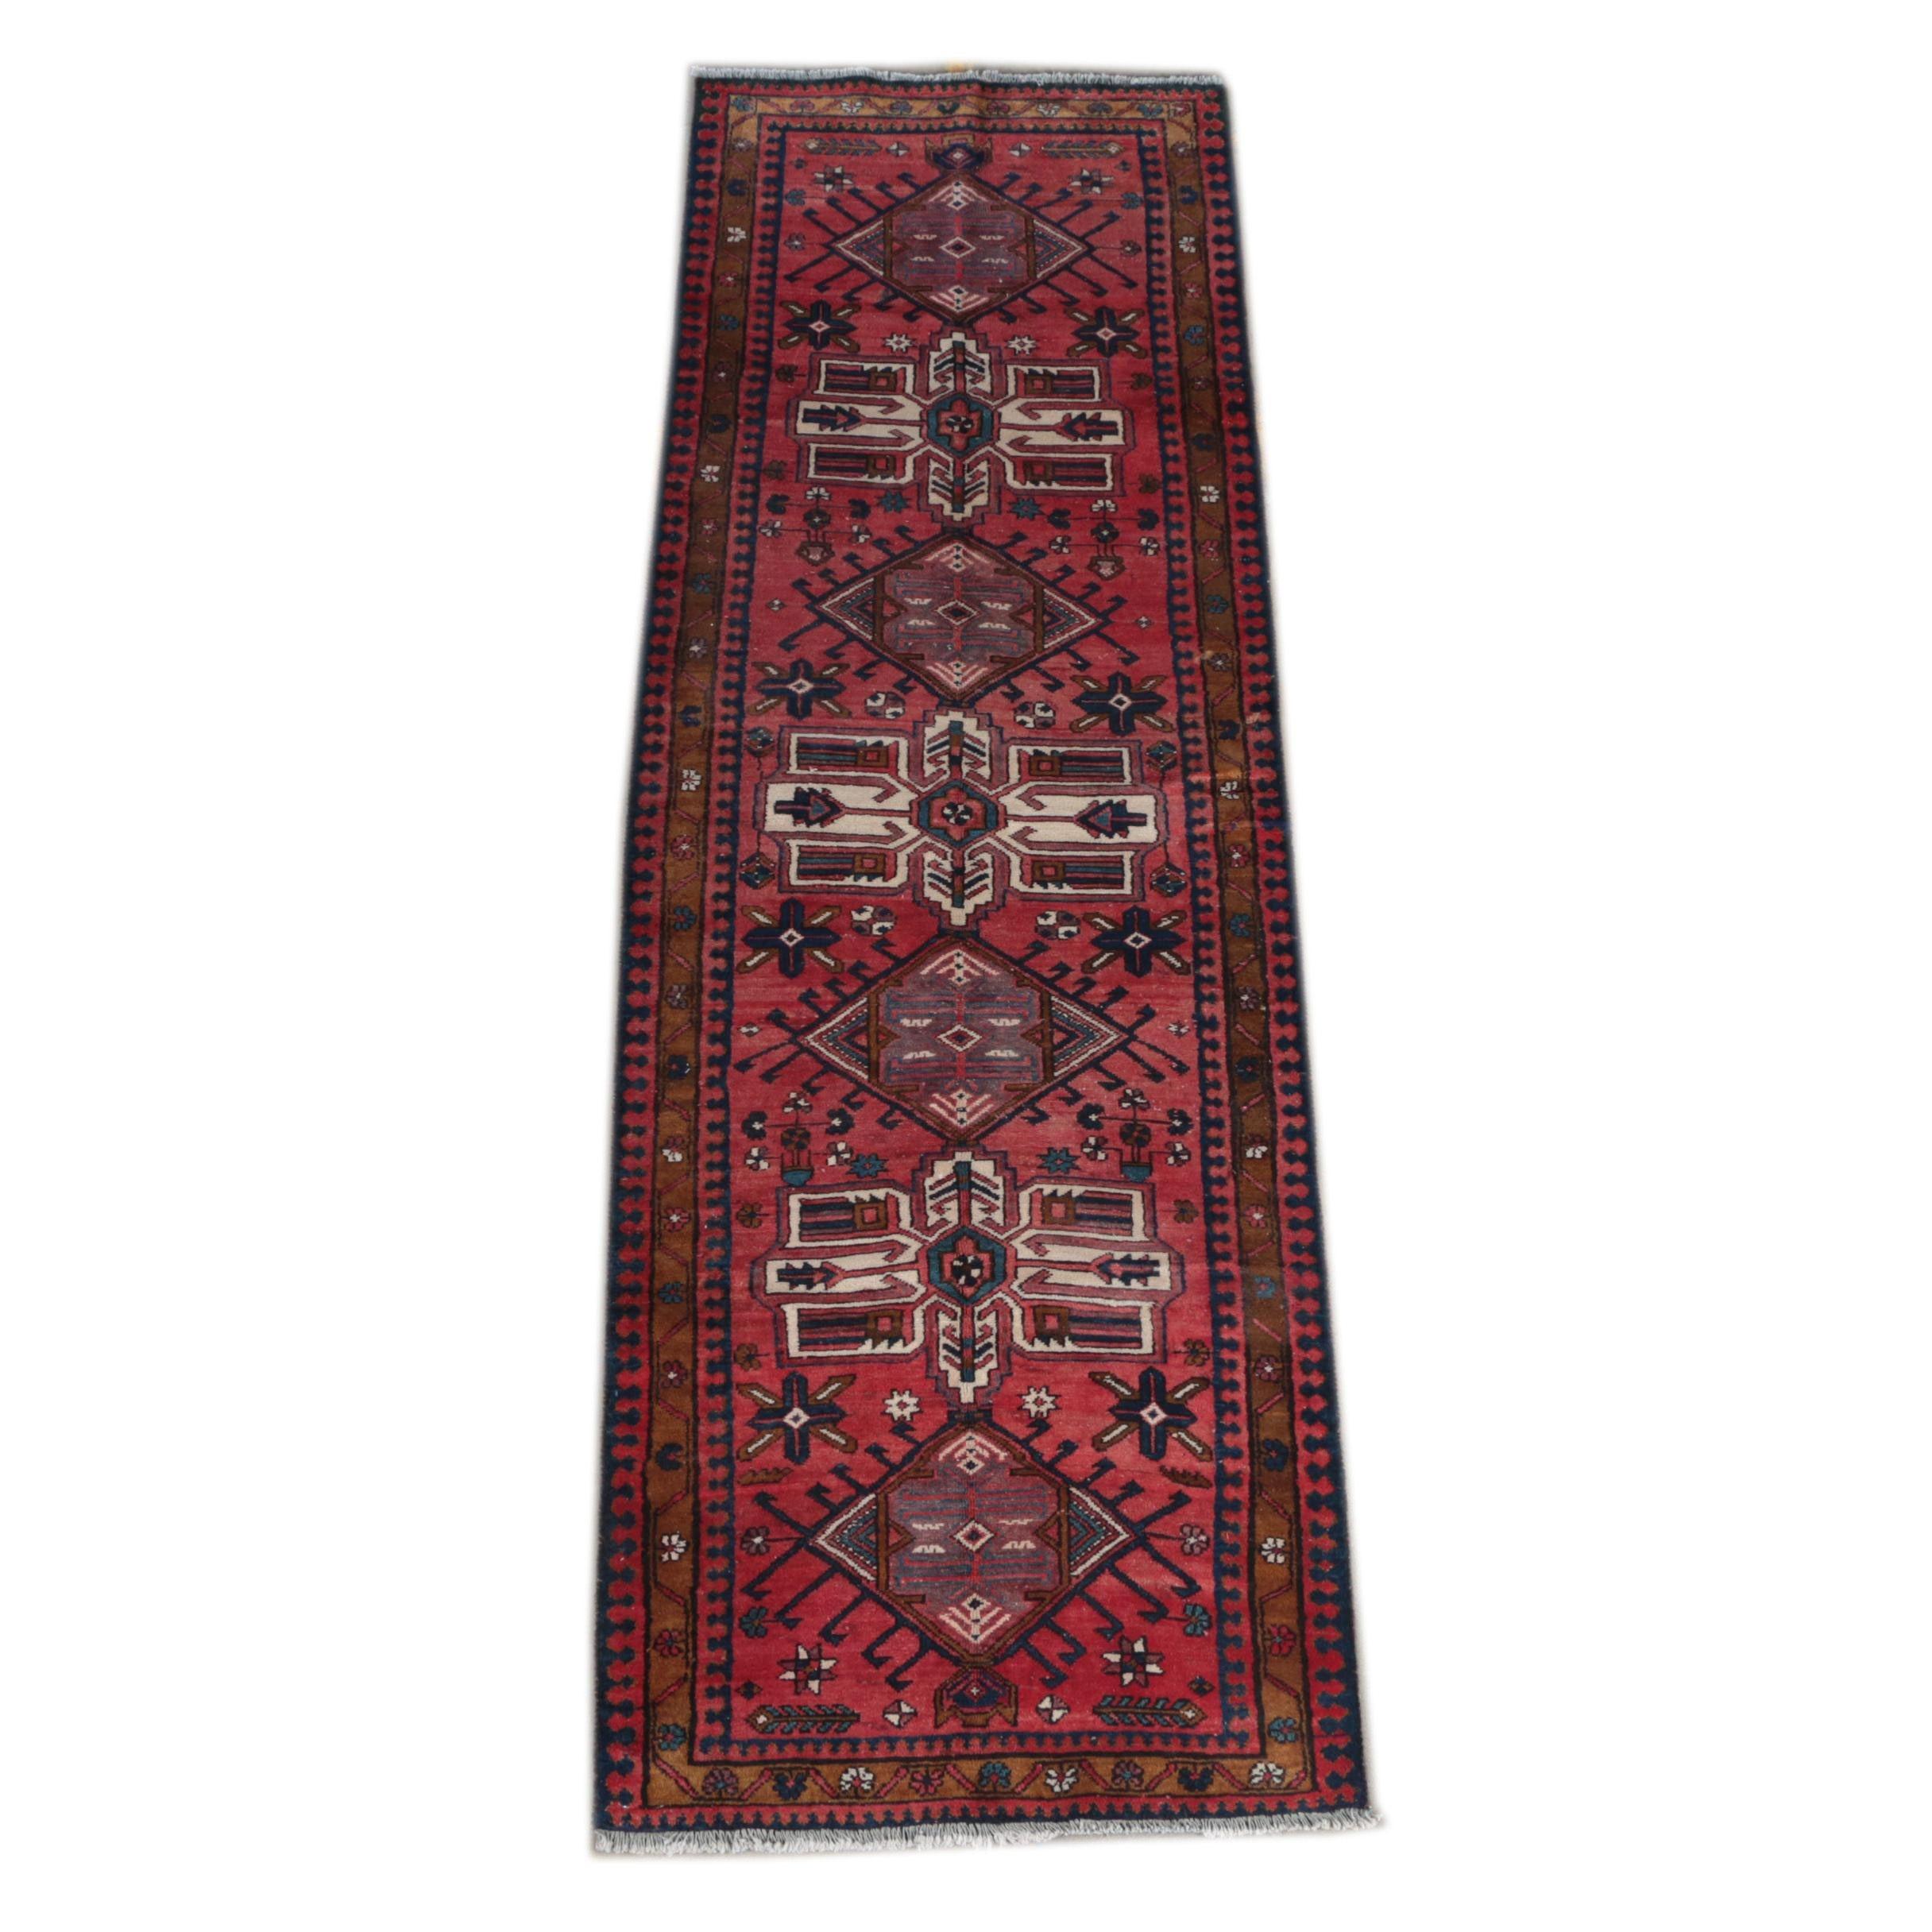 Hand-Knotted Caucasian Carpet Runner